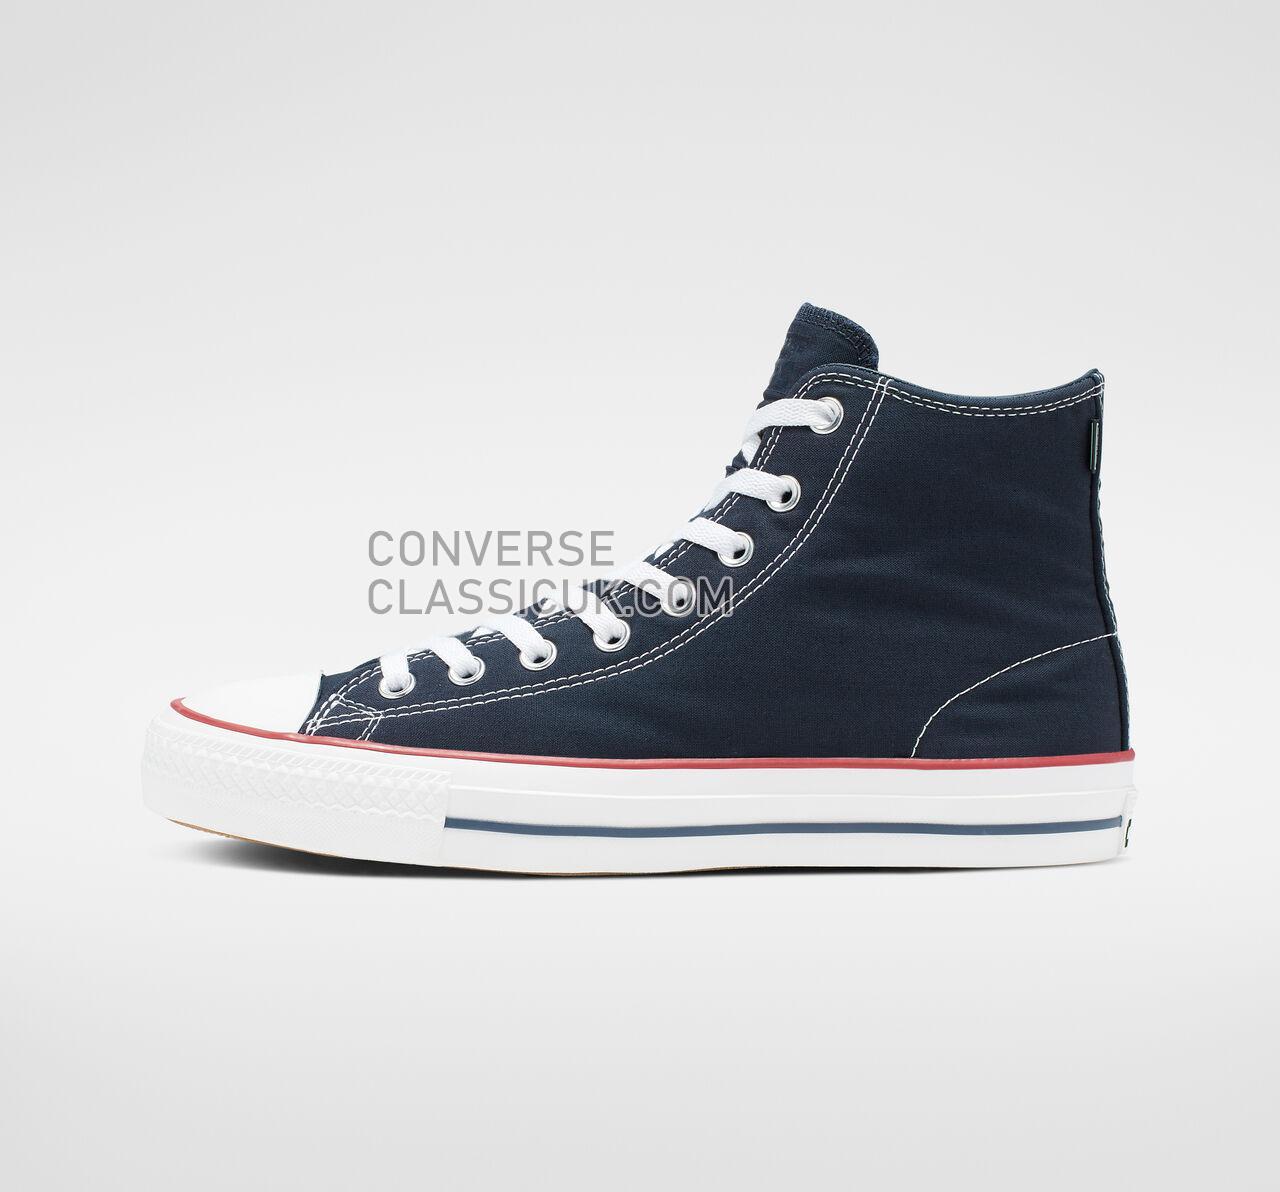 Converse CTAS Pro Archive Prints High Top Mens Womens Unisex 165338C Obsidian/White/Enamel Red Shoes